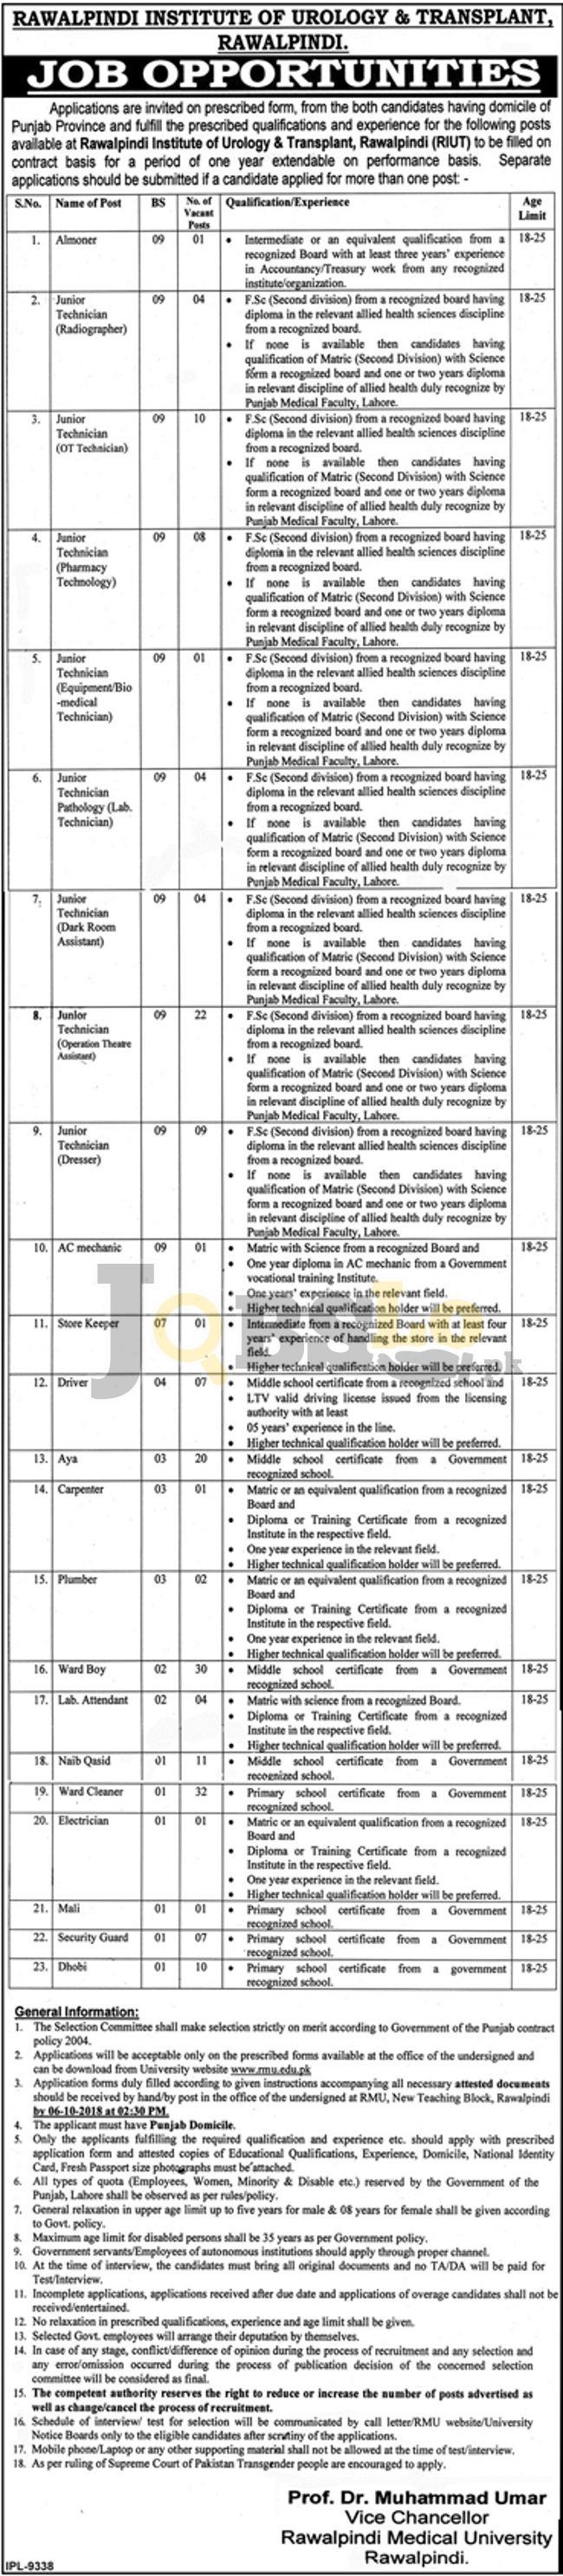 Rawalpindi Medical University Jobs 2018 RMU Application Form Download | www.rmur.edu.pk